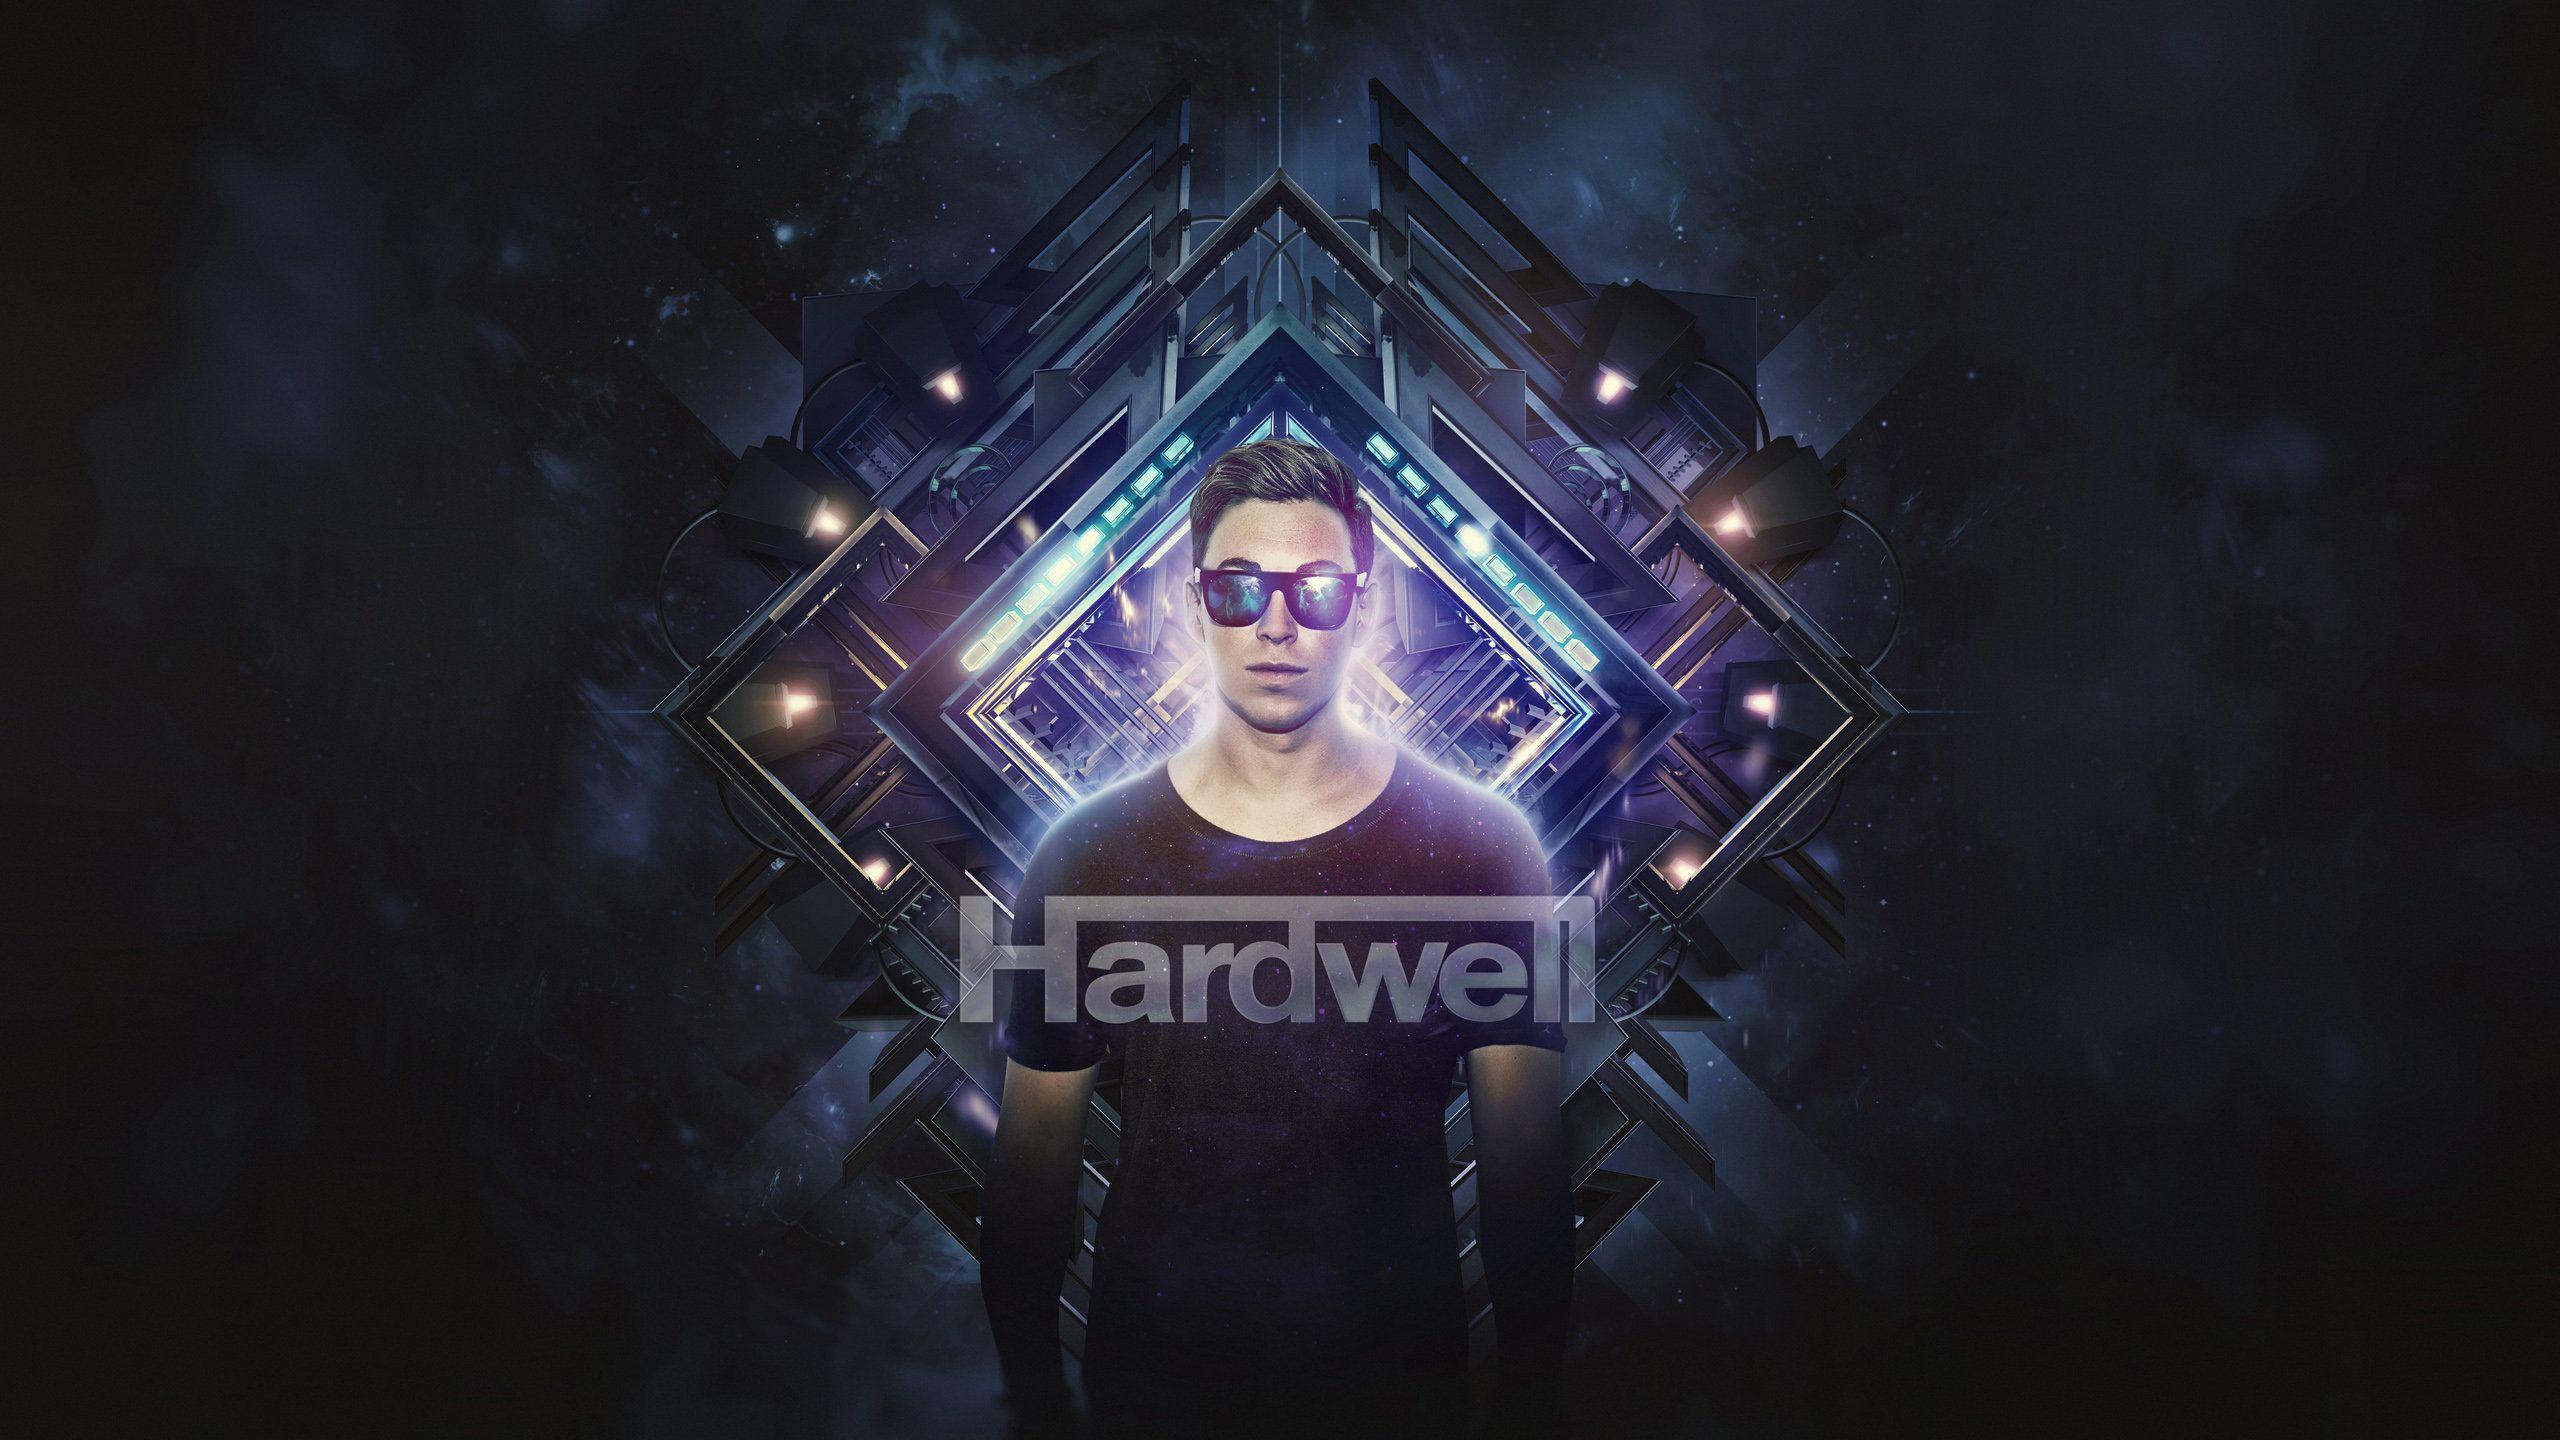 Hardwell I Am Hardwell Music Dj Poster Wallpapers Hd: Hardwell. #hardwell #djwallpaper #dj #edm #wallpaper